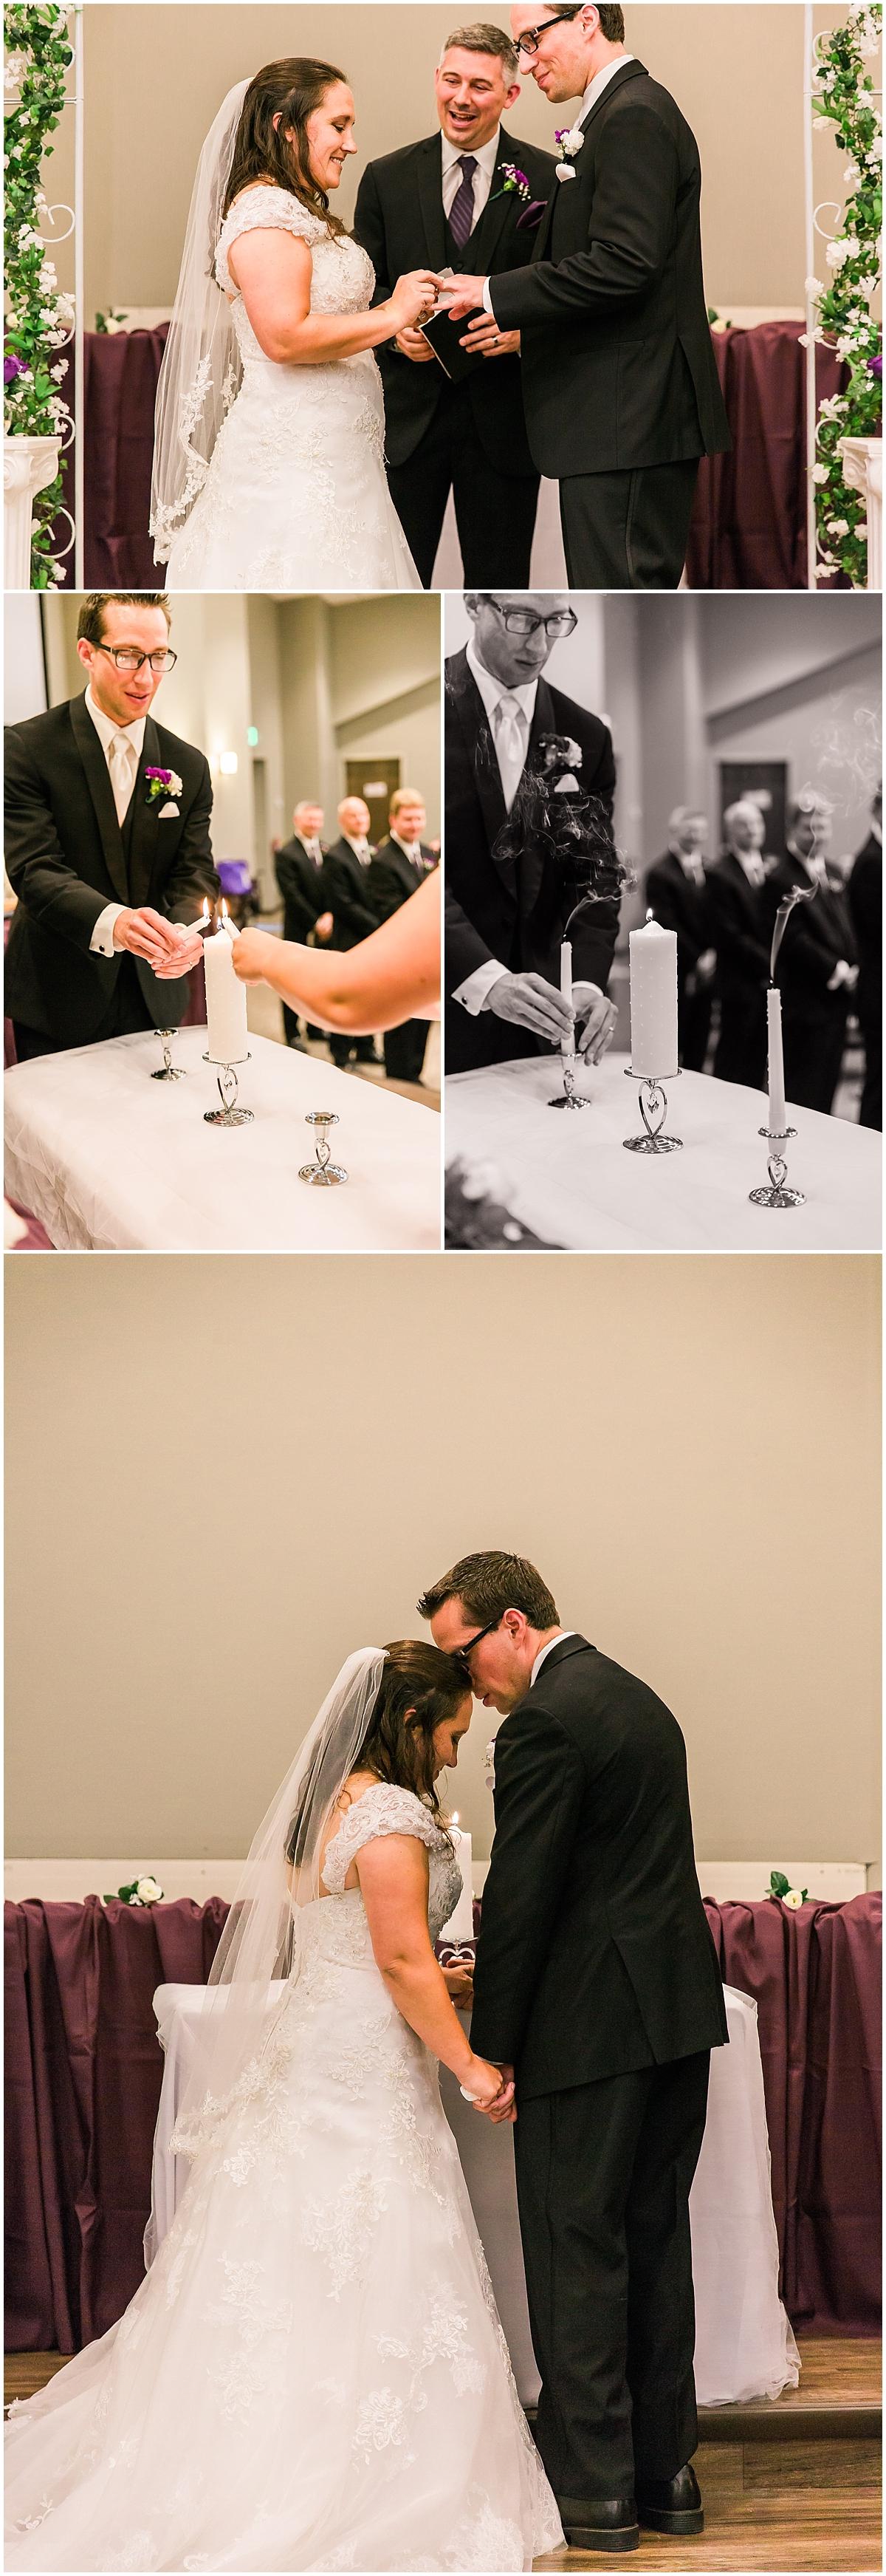 wedding unity candle ceremony